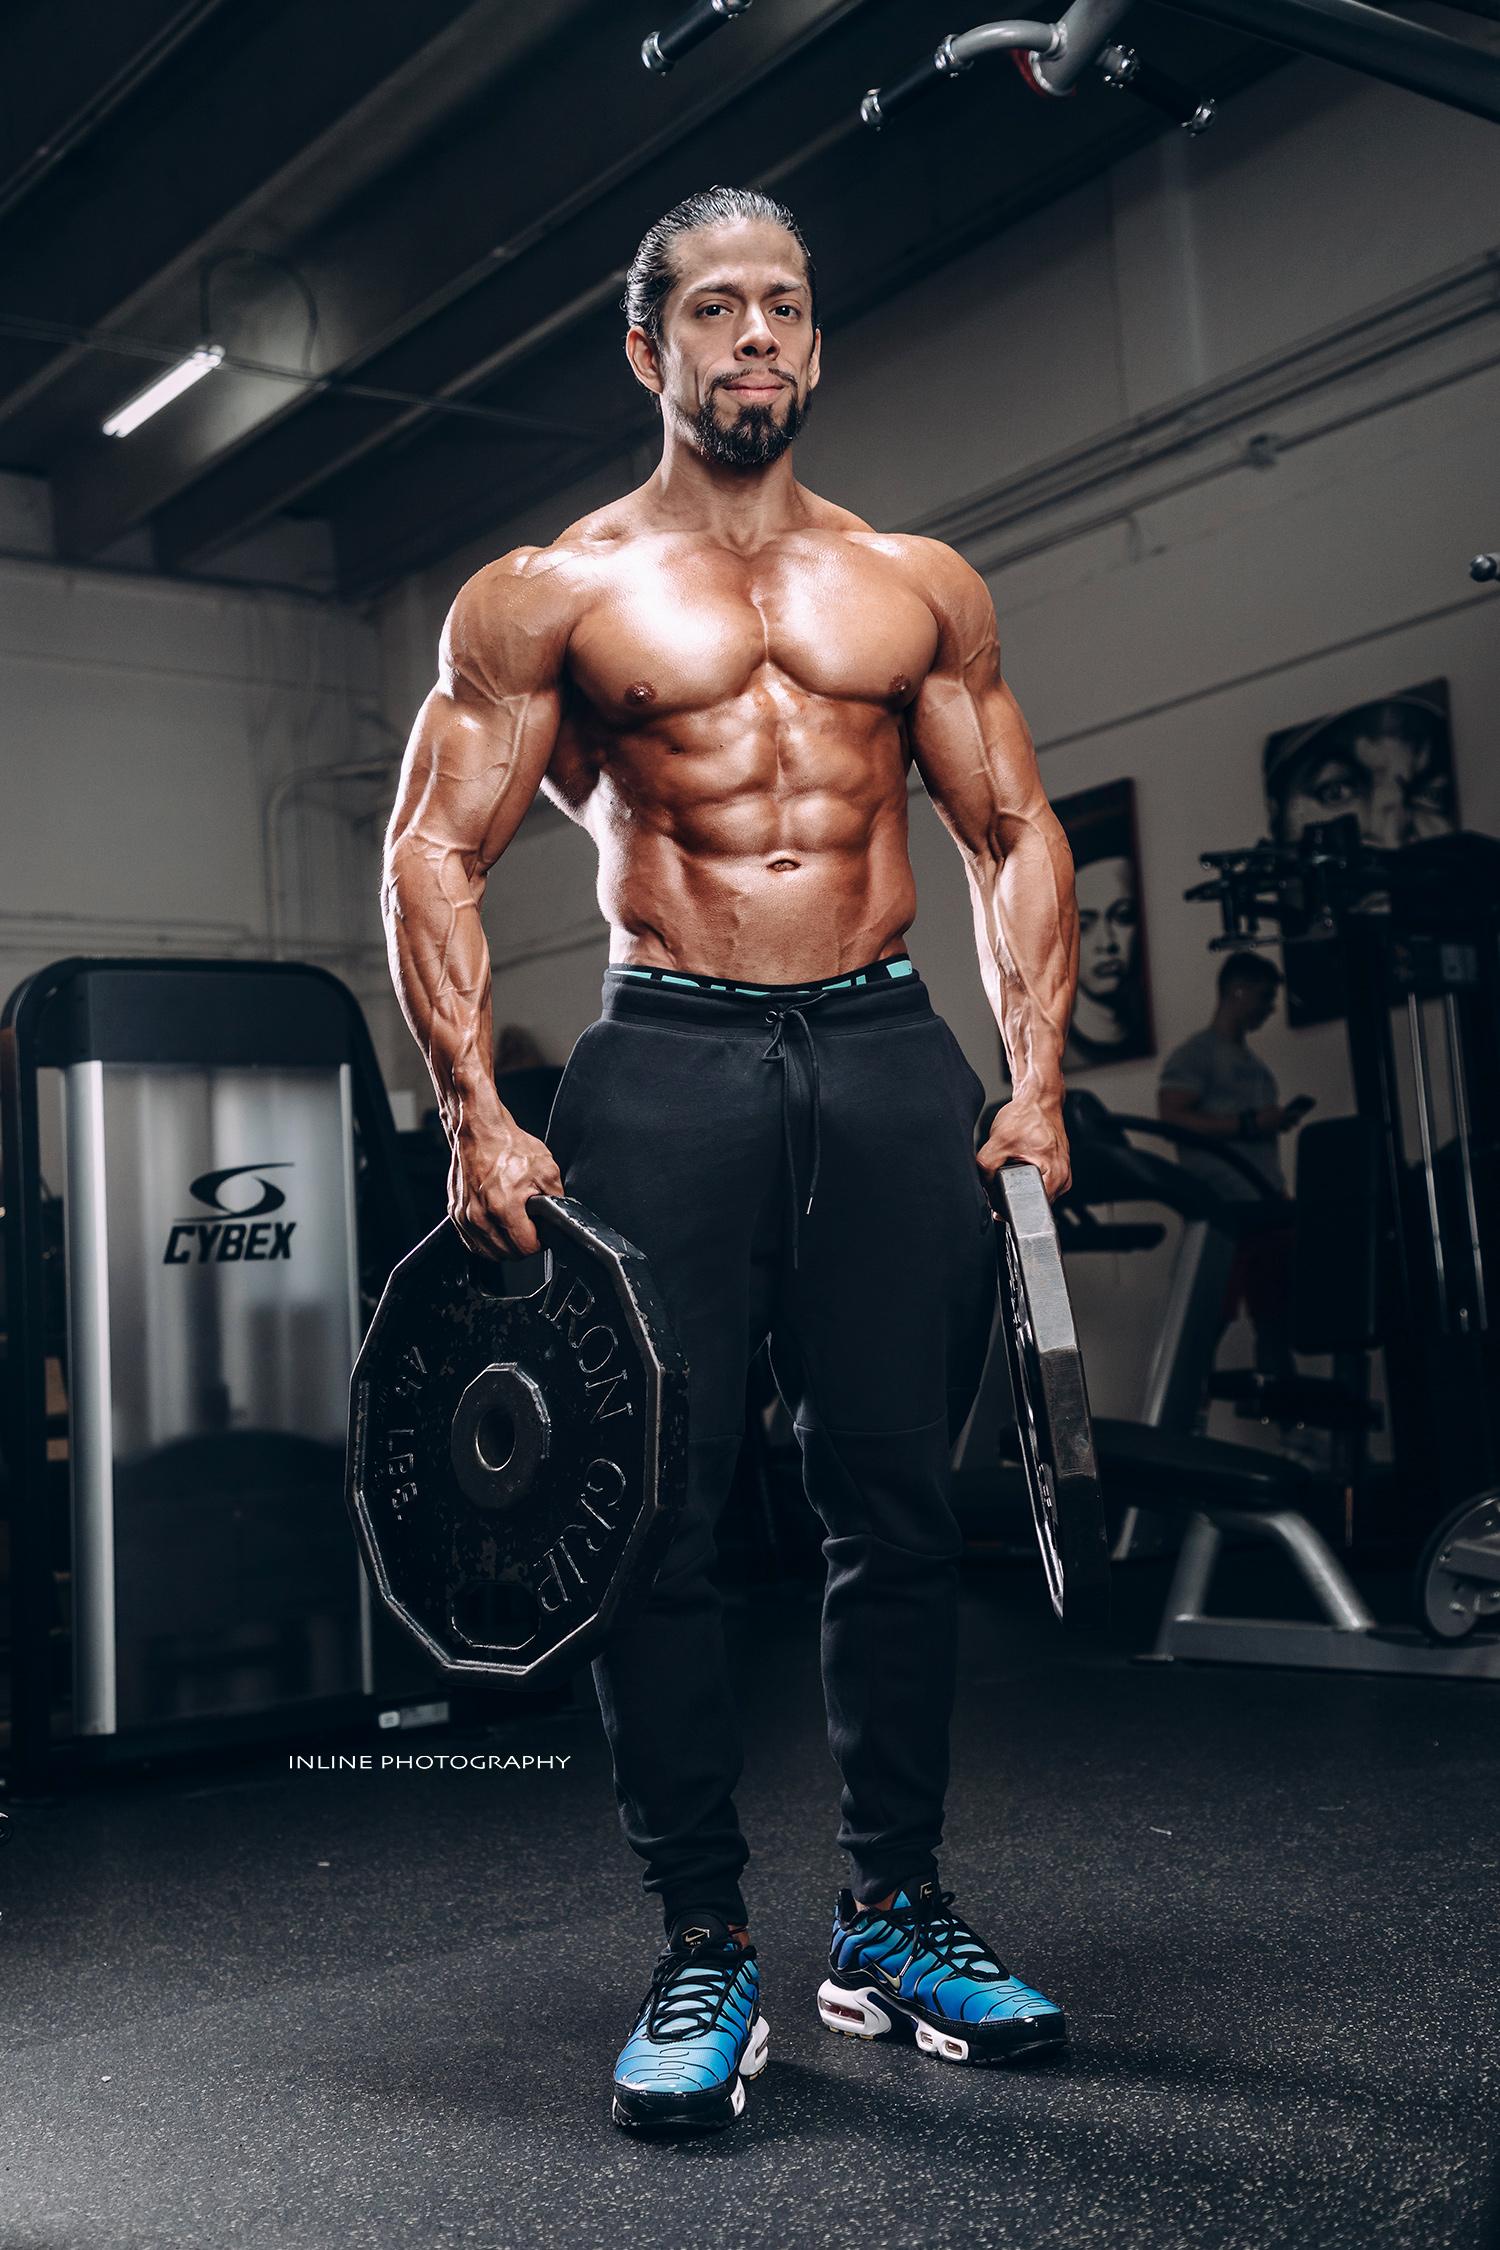 angel_bajana_fitness_model_gym_shoot_inlinephotography.jpg